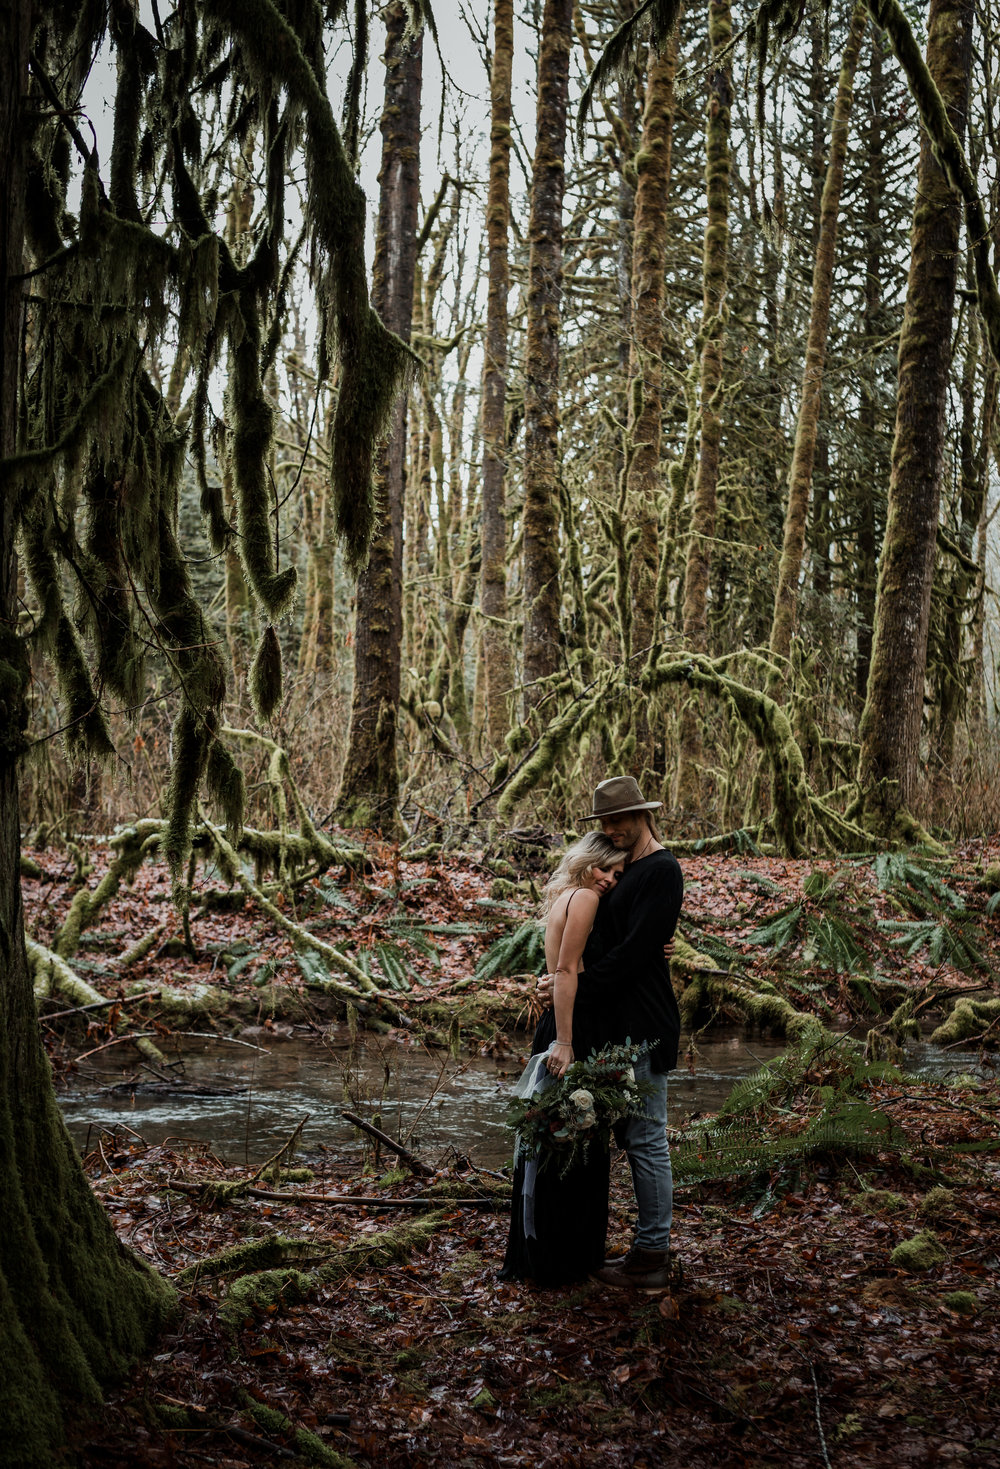 Squamish Wedding Photographer - Squamish Engagement Photos -  Vancouver Wedding Photographer & Videographer - Sunshine Coast Wedding Photos - Sunshine Coast Wedding Photographer - Jennifer Picard Photography - 1A5A2825.jpg